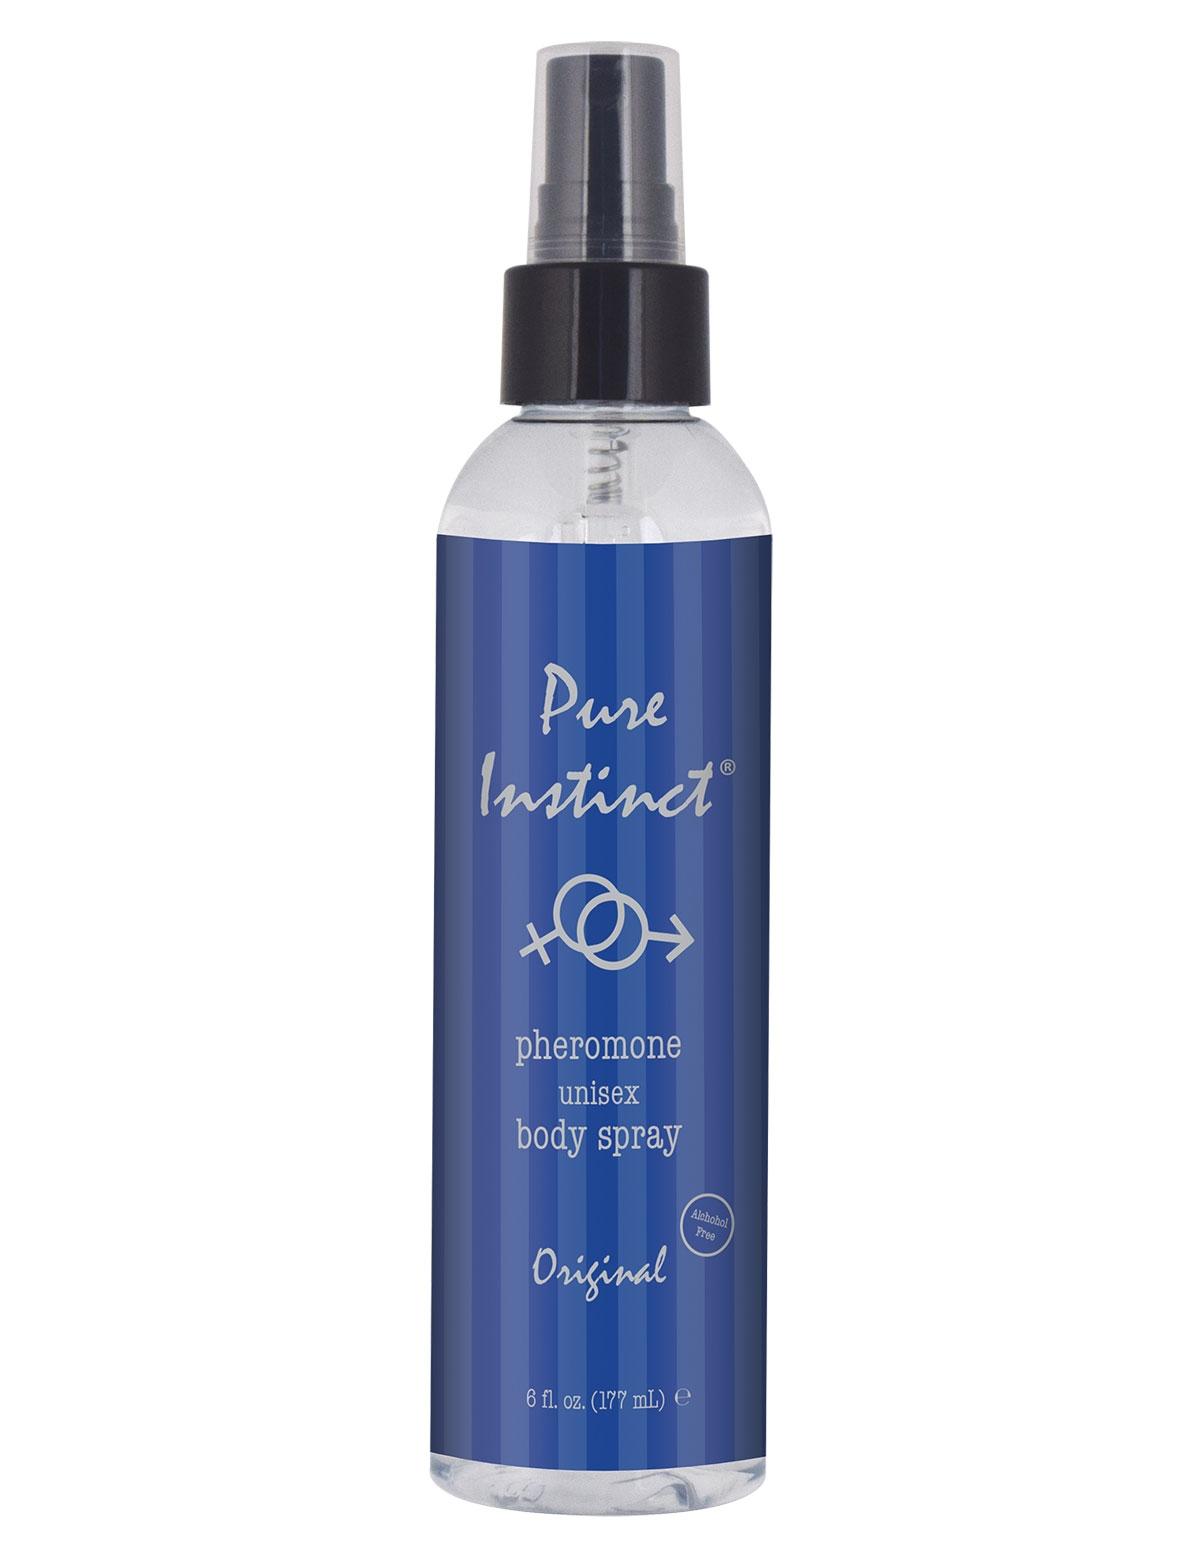 Pure Instinct Unisex Pheromone Body Spray